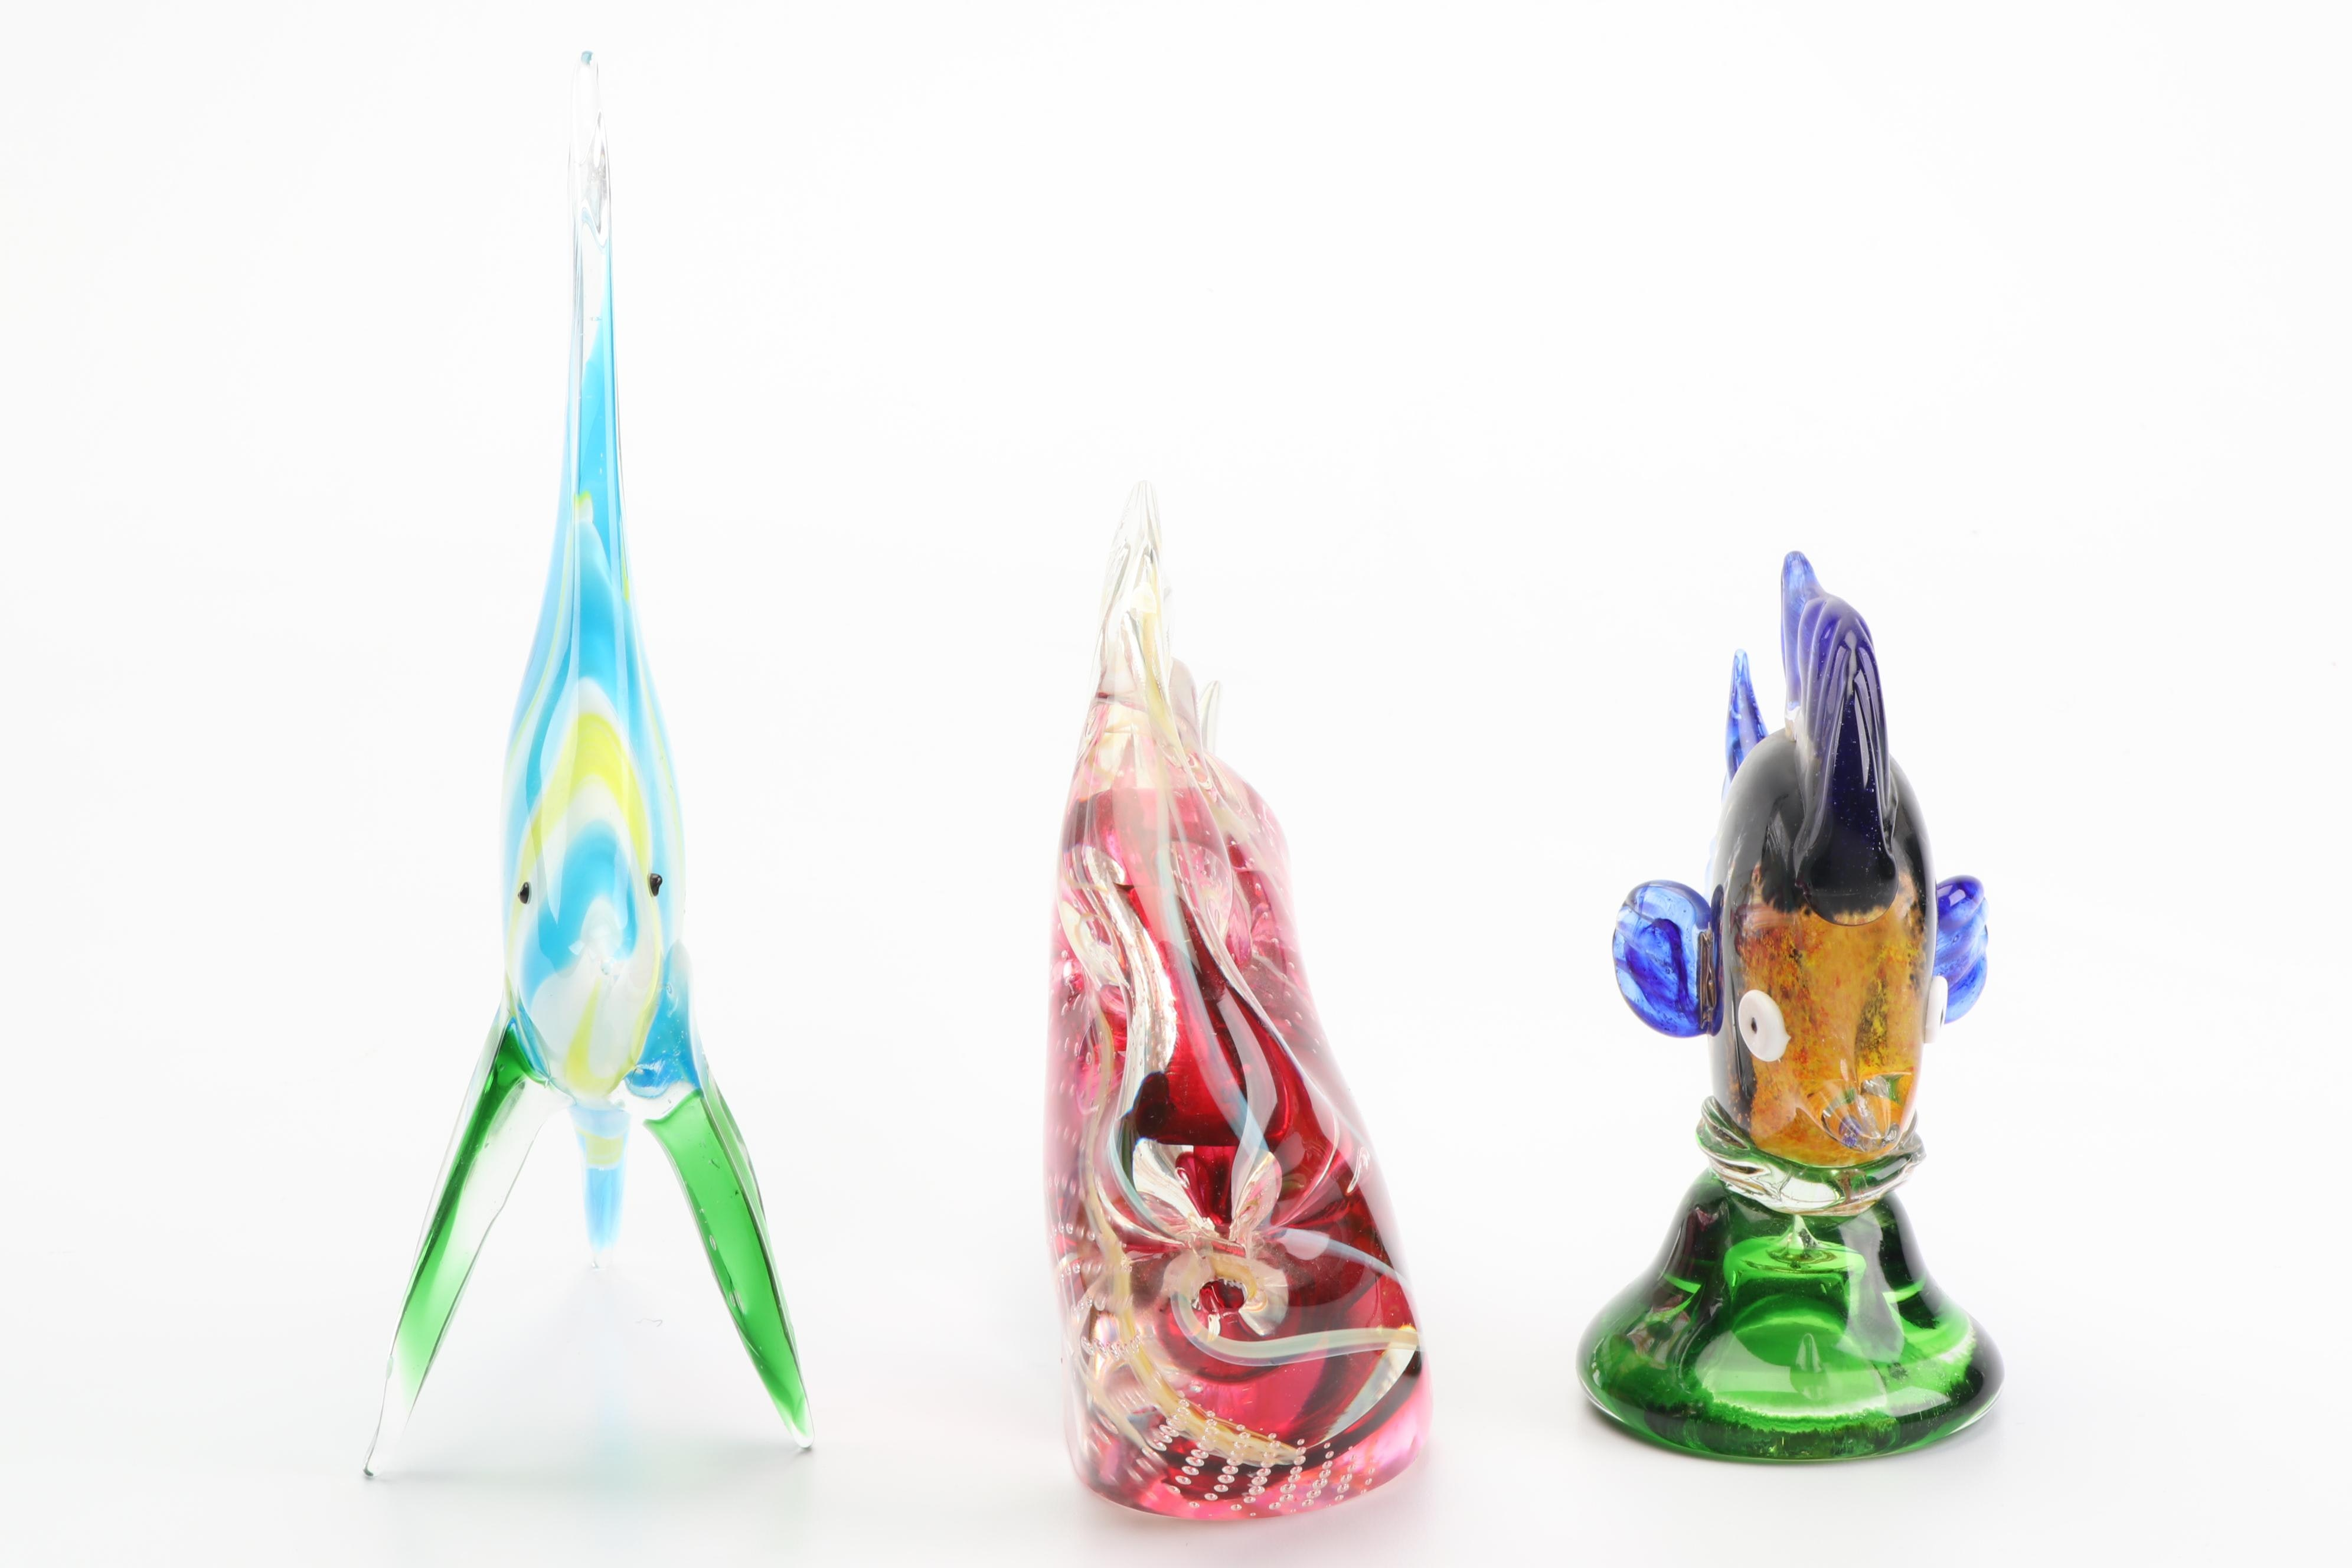 Dante Veni Murano and Rollin Karg Art Glass Fish